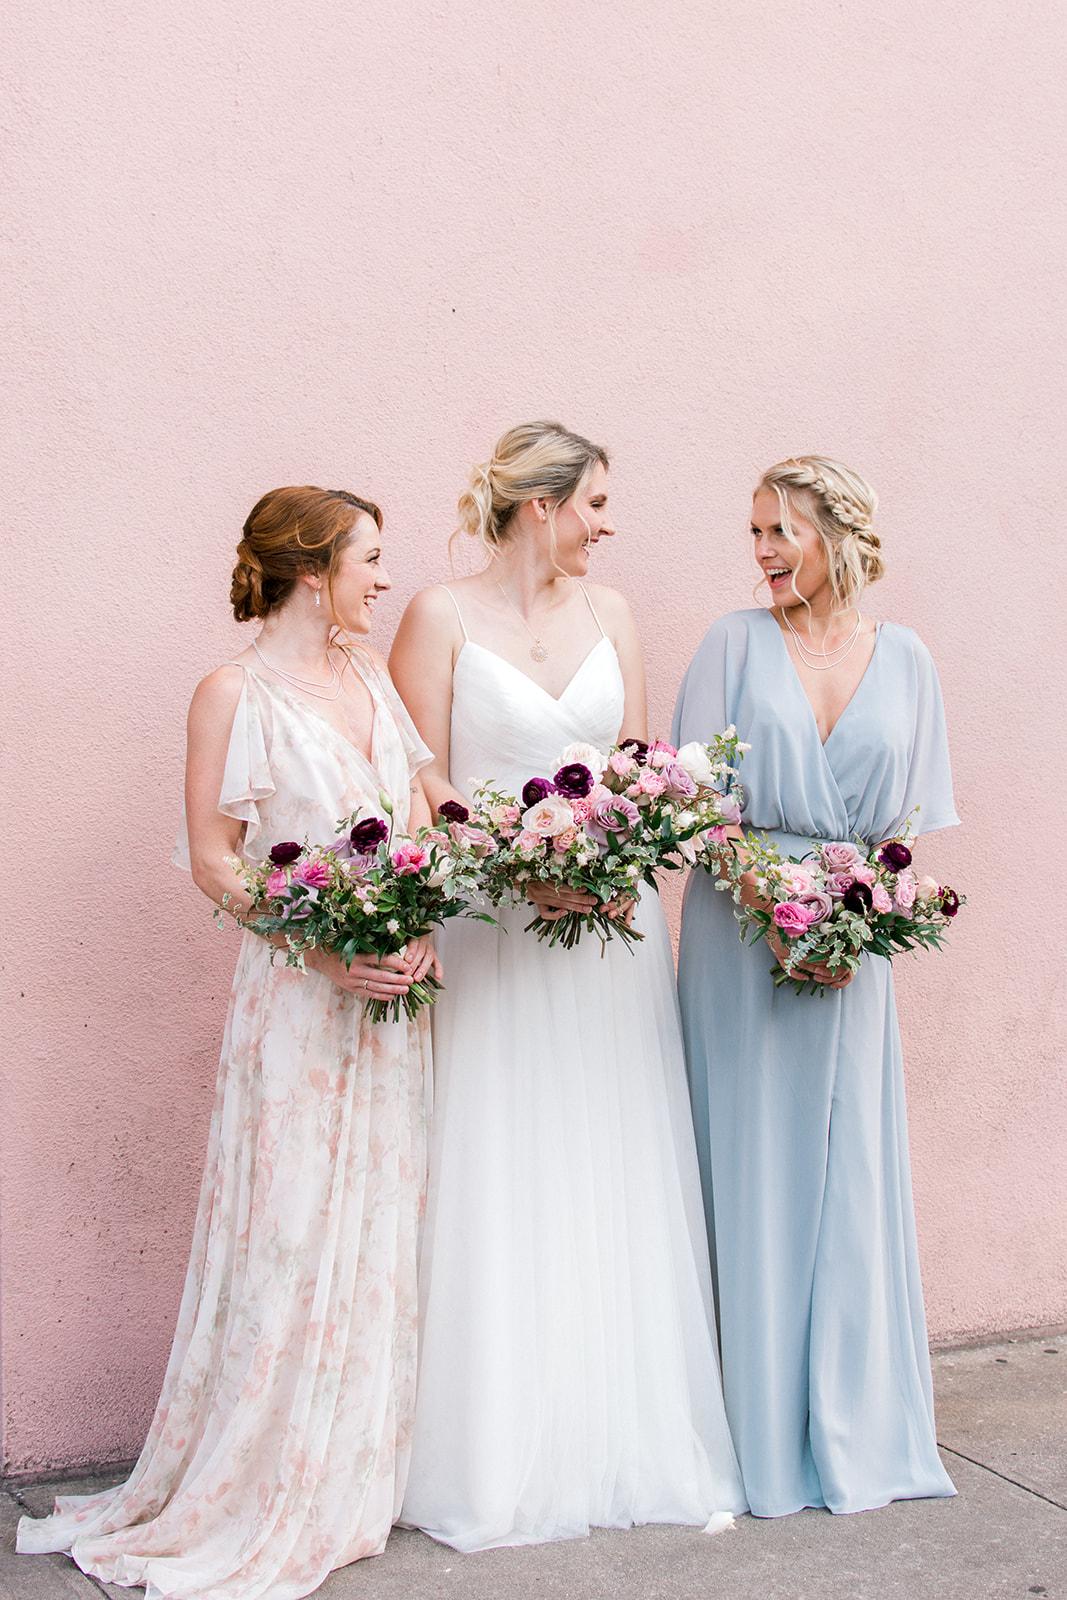 health-coach-weight-loss-for-brides-tips-ivory-and-beau-savannah-bridal-shop-savannah-wedding-dresses-savannah-bridal-boutique-rebecca-ingram-wedding-dress-jenny-yoo-floral-print-bridesmaid-dresses.jpg